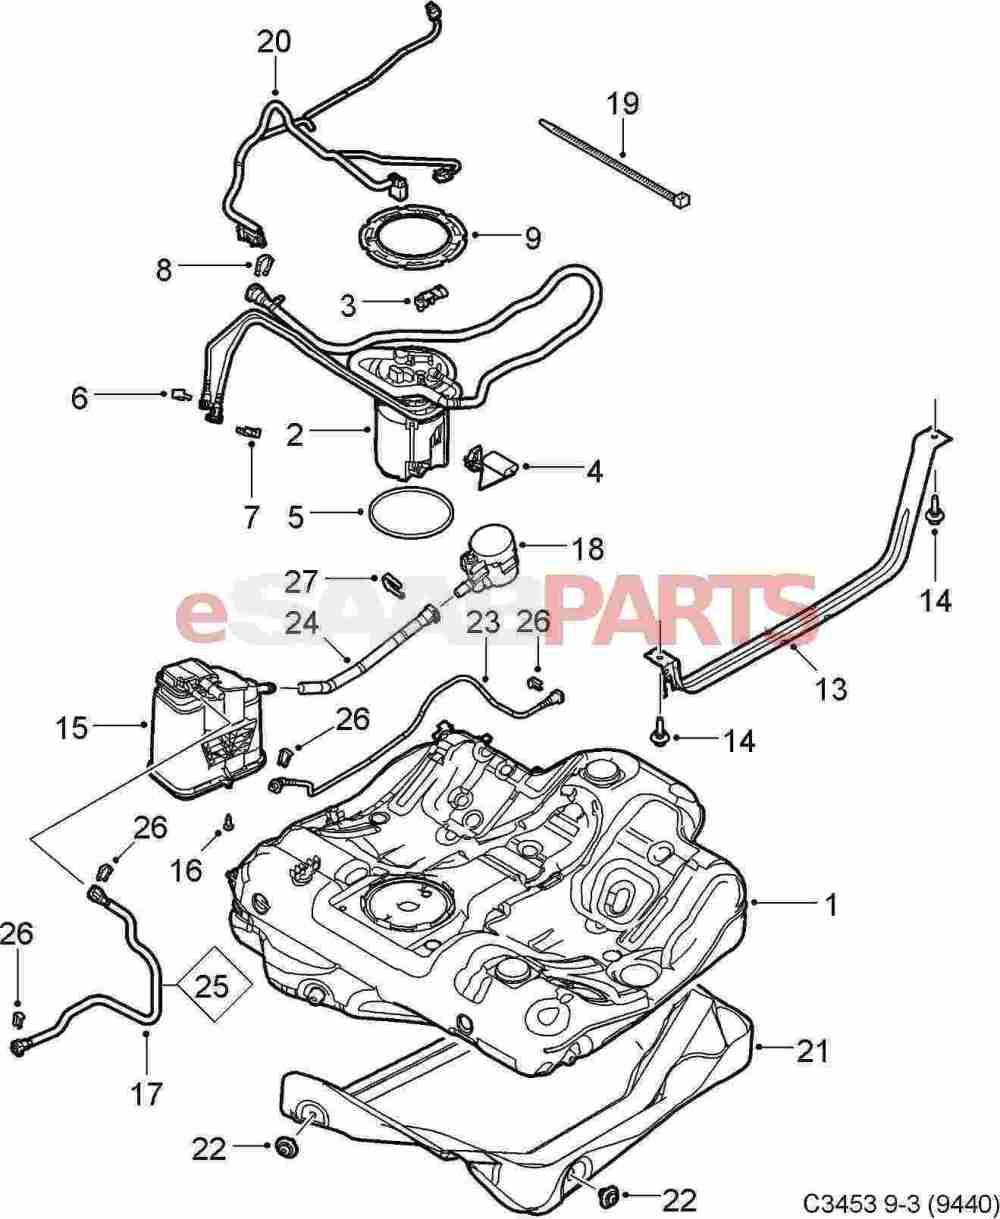 medium resolution of 99 saab 9 3 fuel tank diagram wiring diagram third level99 saab 9 3 fuel tank